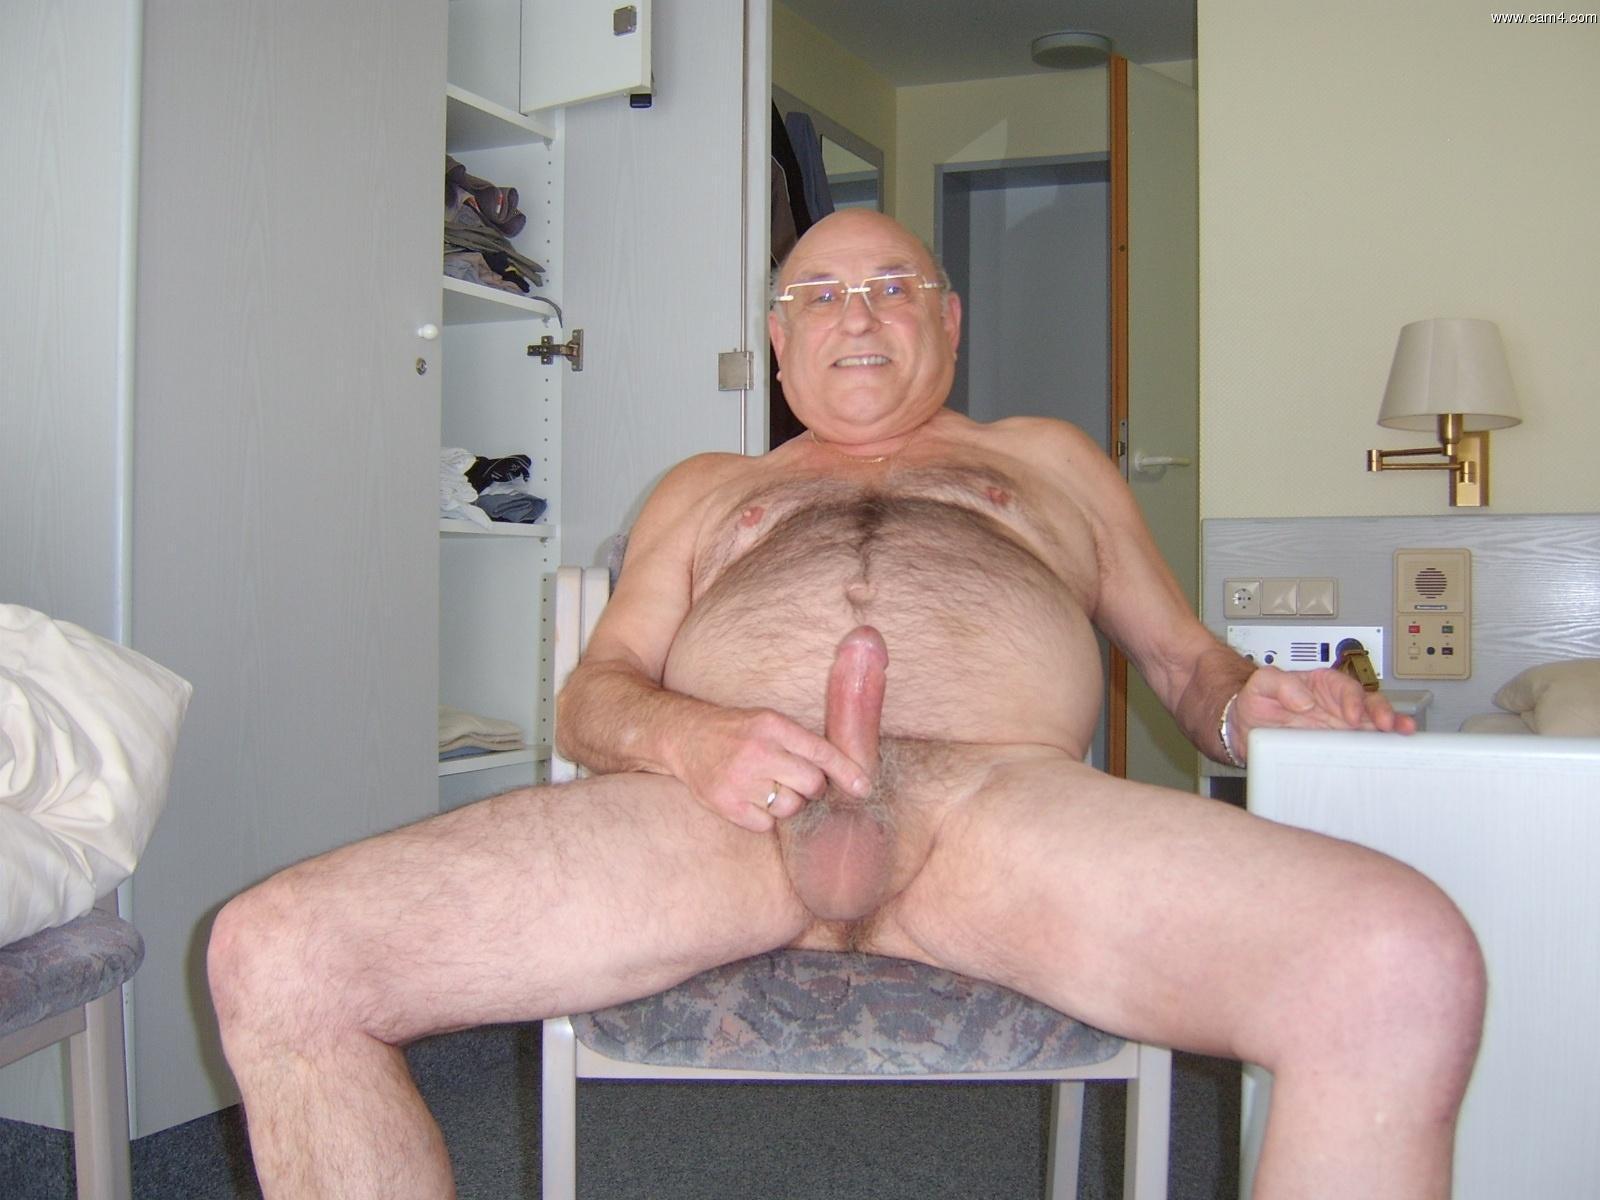 old-fat-asian-men-nude-xbox-webcam-porn-sex